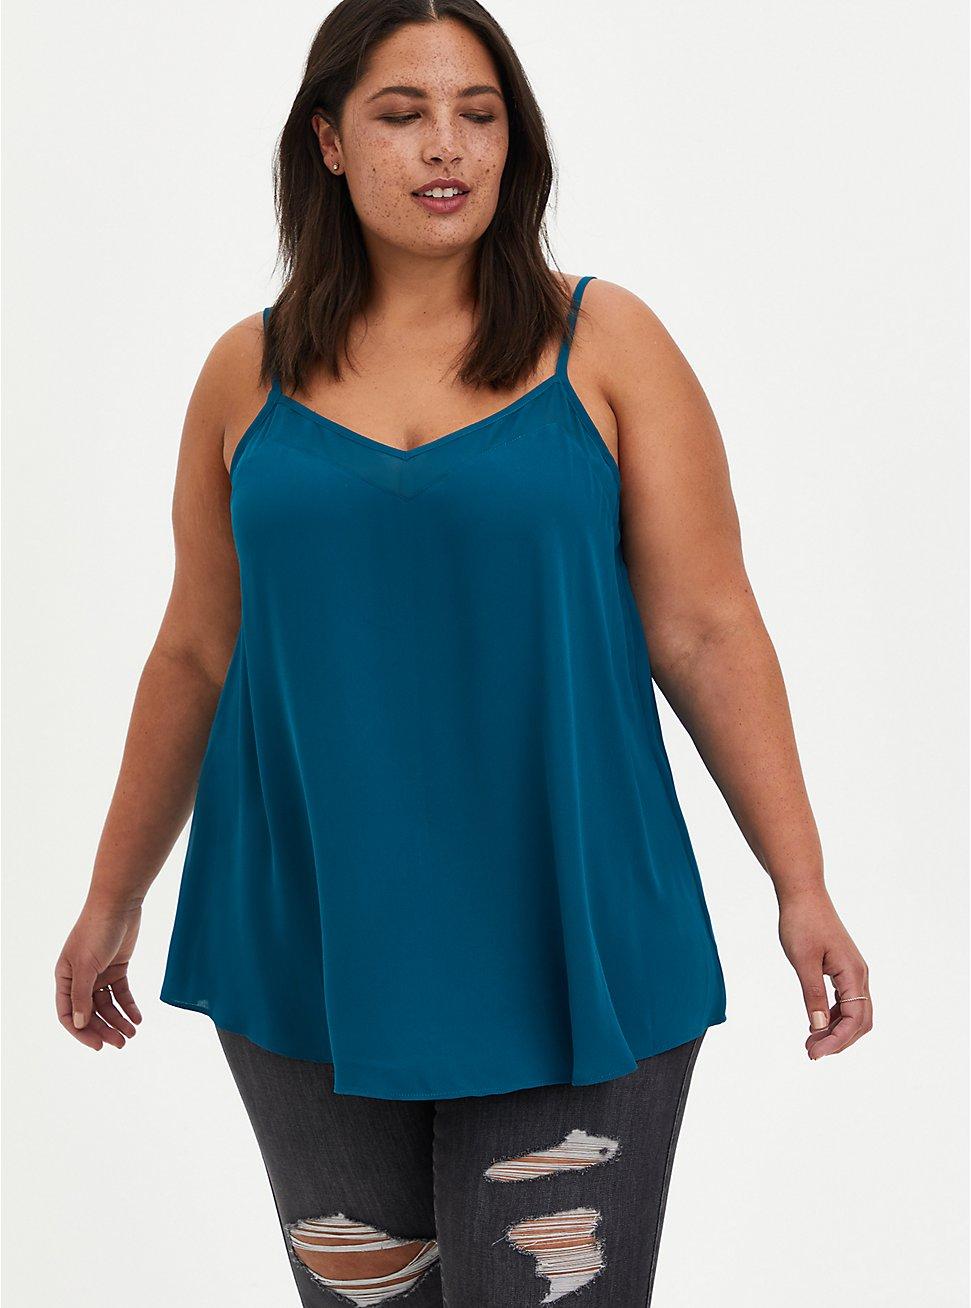 Sophie Cami - Chiffon Inset Georgette Teal, BLUE, hi-res